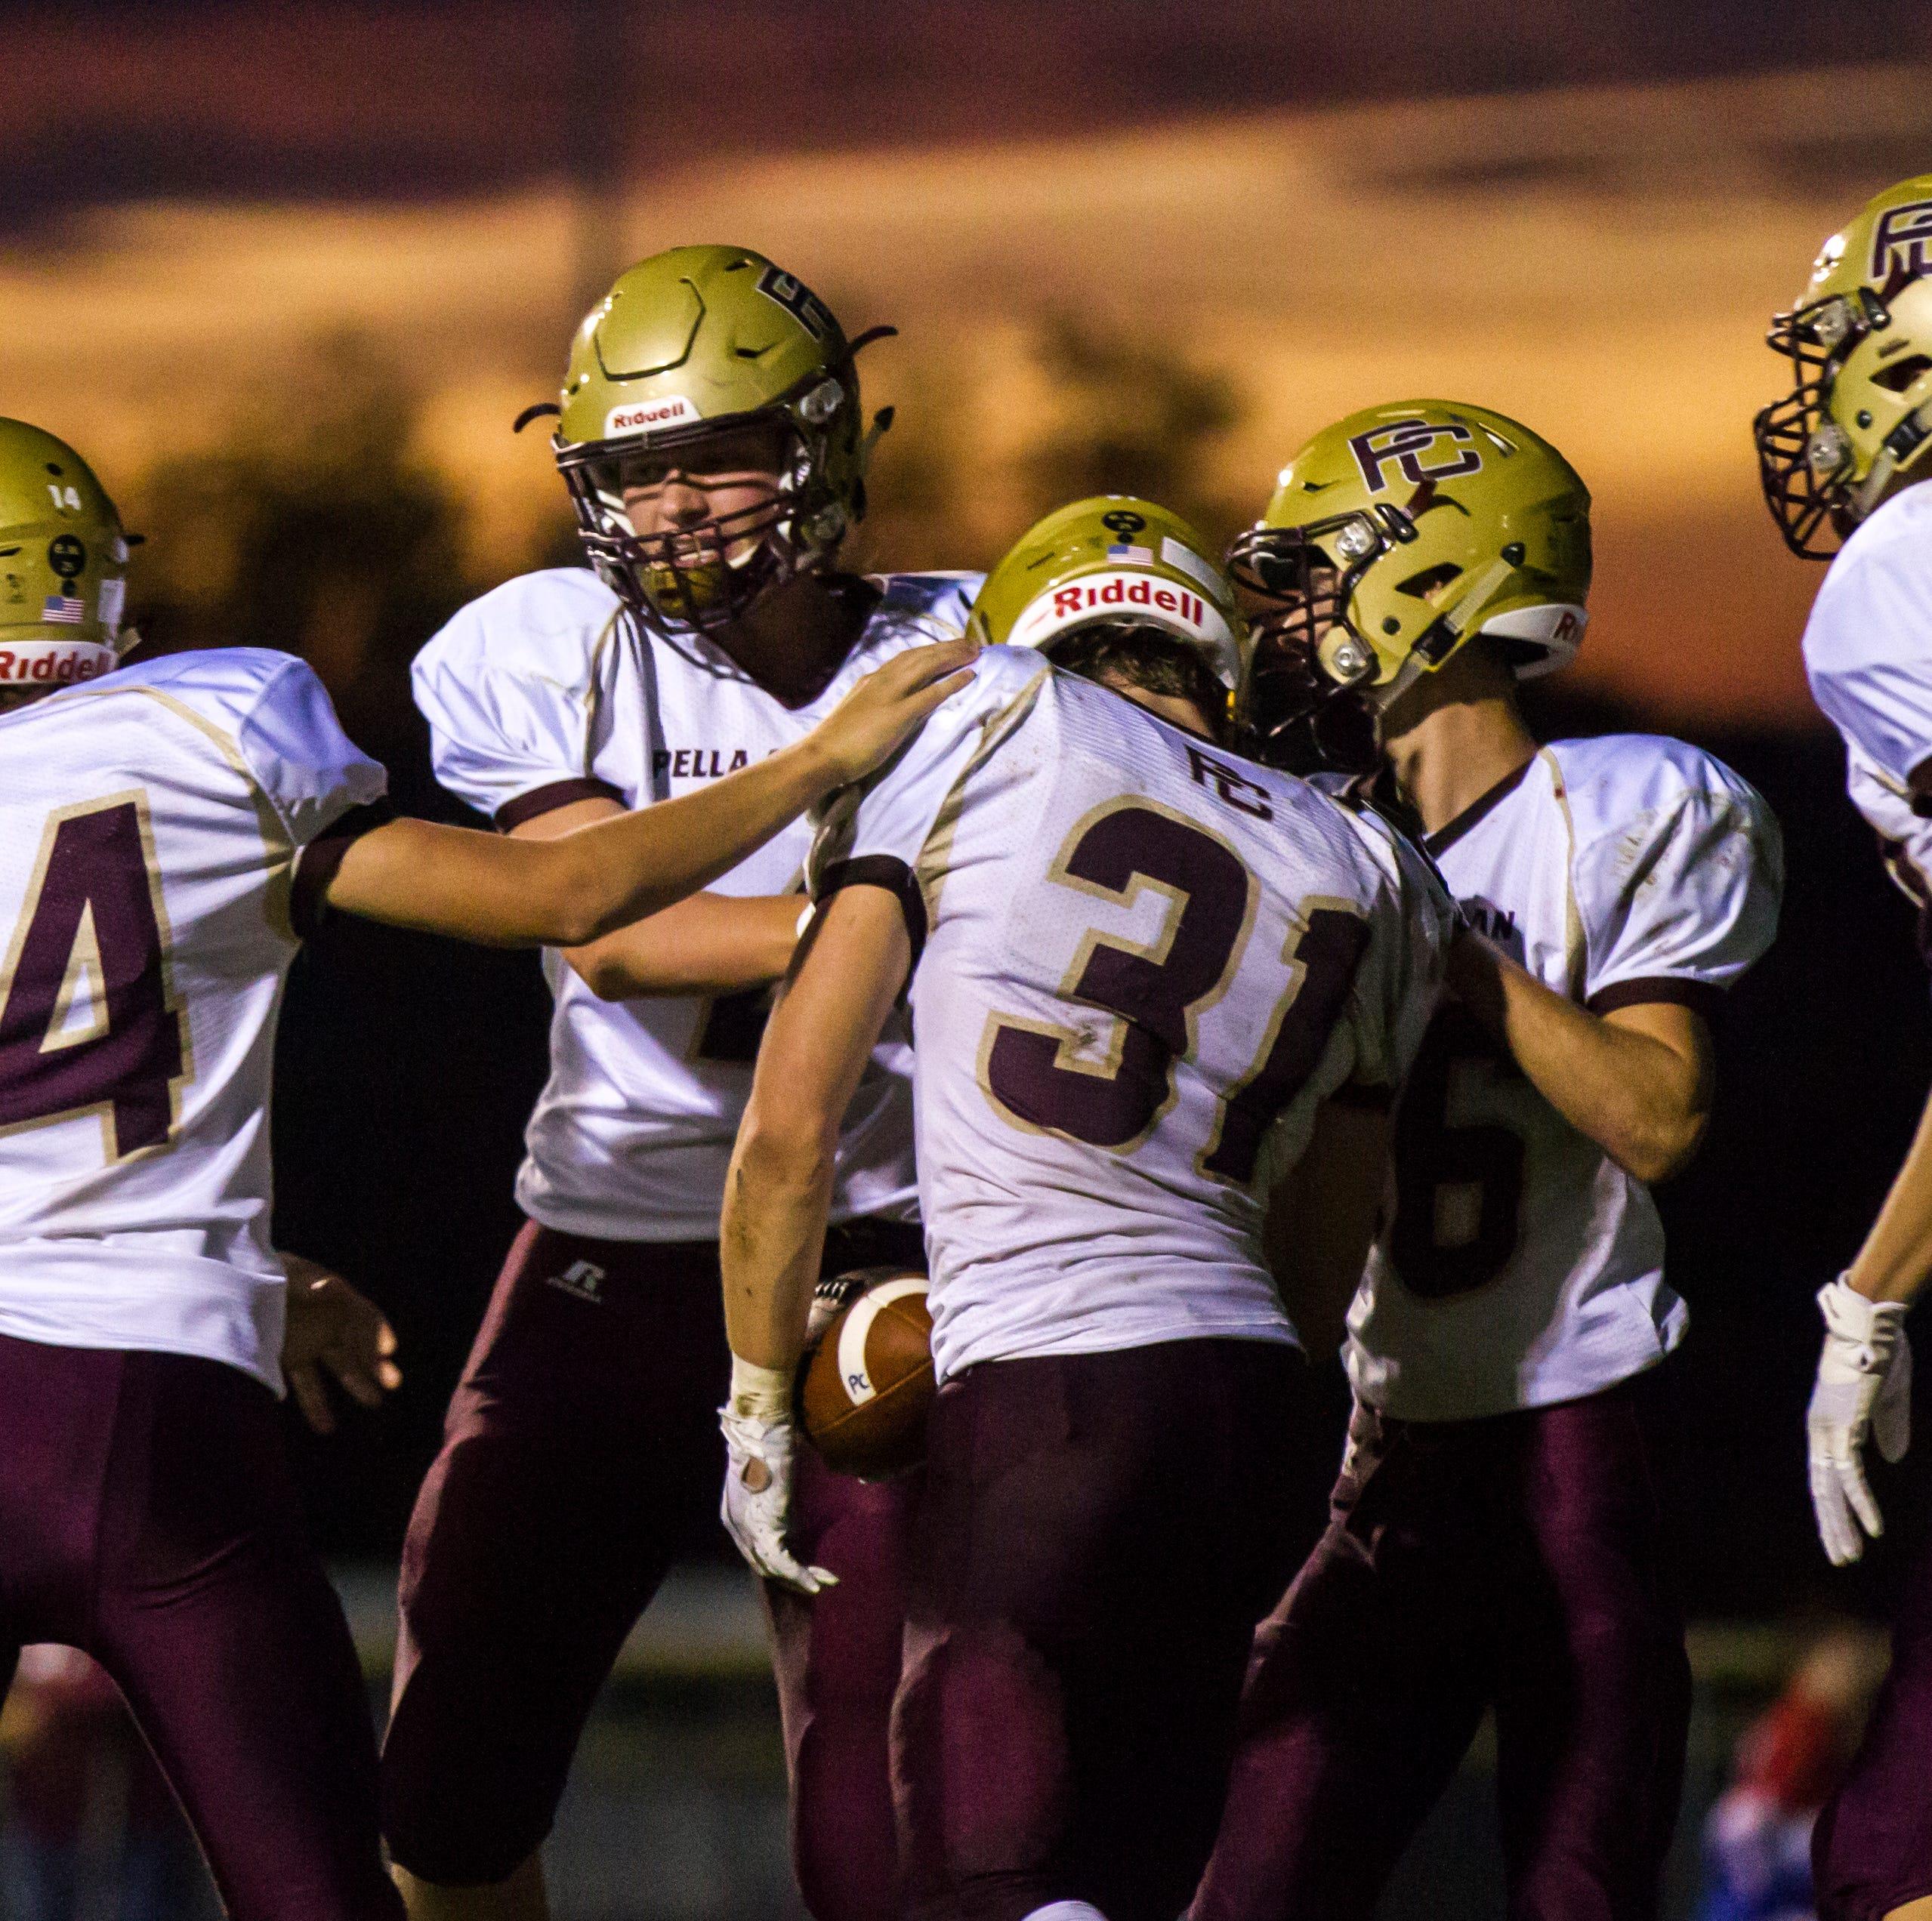 Iowa high school football: What we learned in Pella Christian's 24-21 win over Iowa City Regina